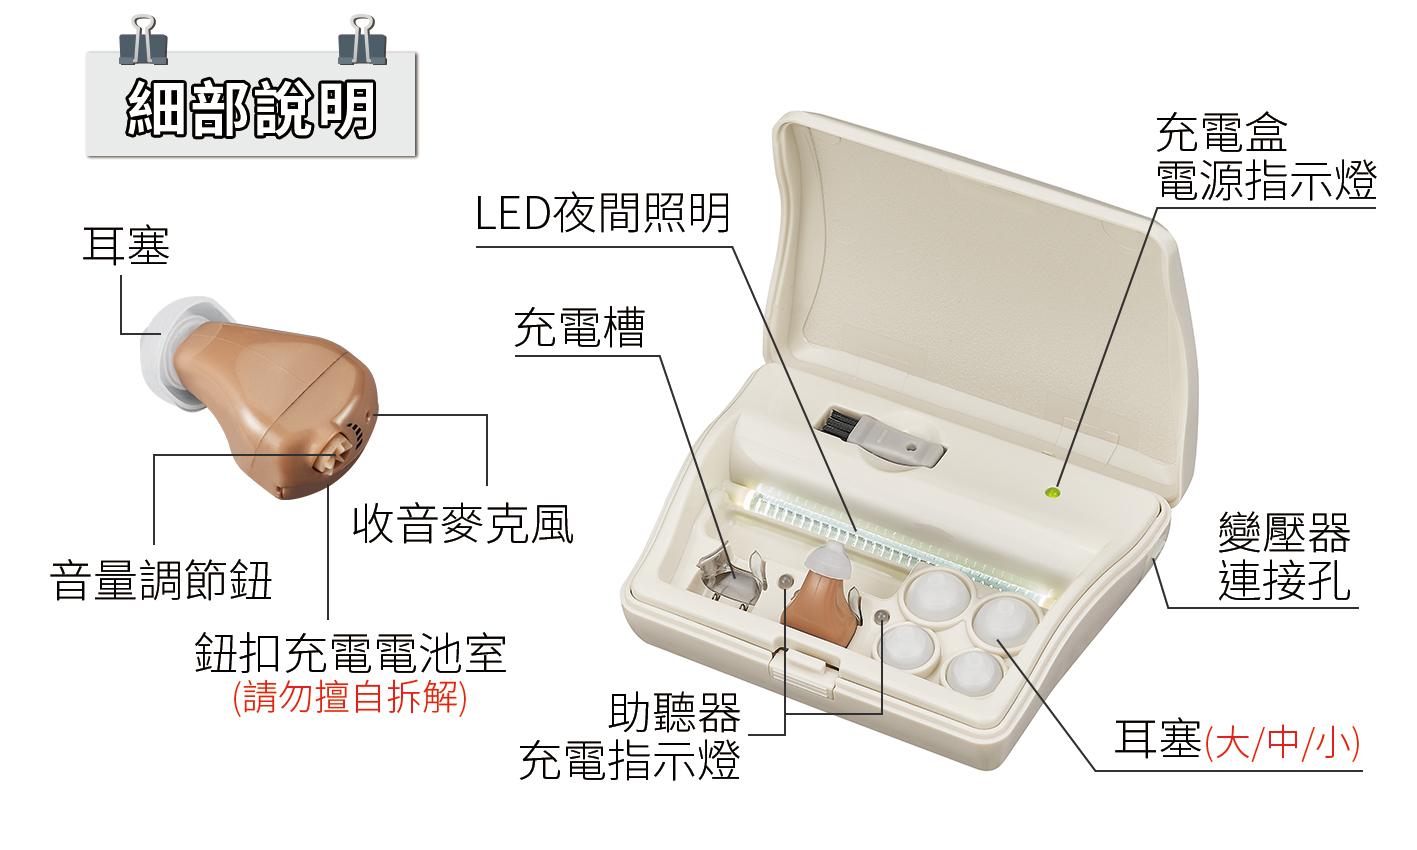 耳寶,6SA2,補助資訊,助聽器